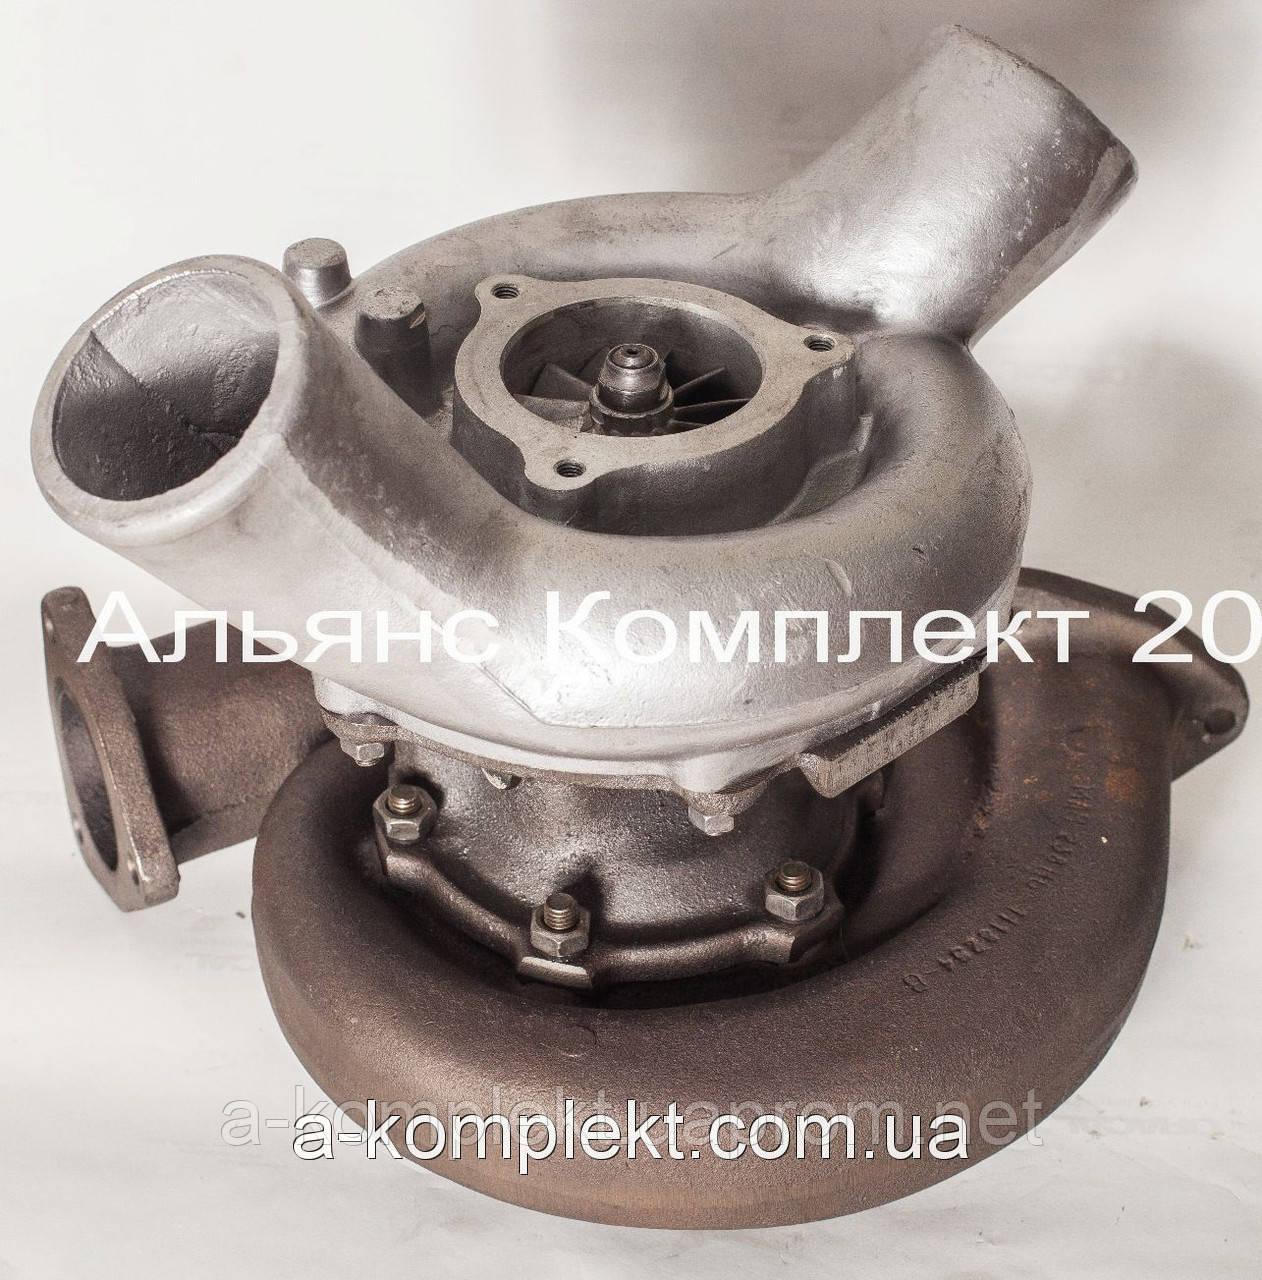 Турбокомпрессор ТКР 9-10 левый (120.000.000-10/ 12.1118010-10)